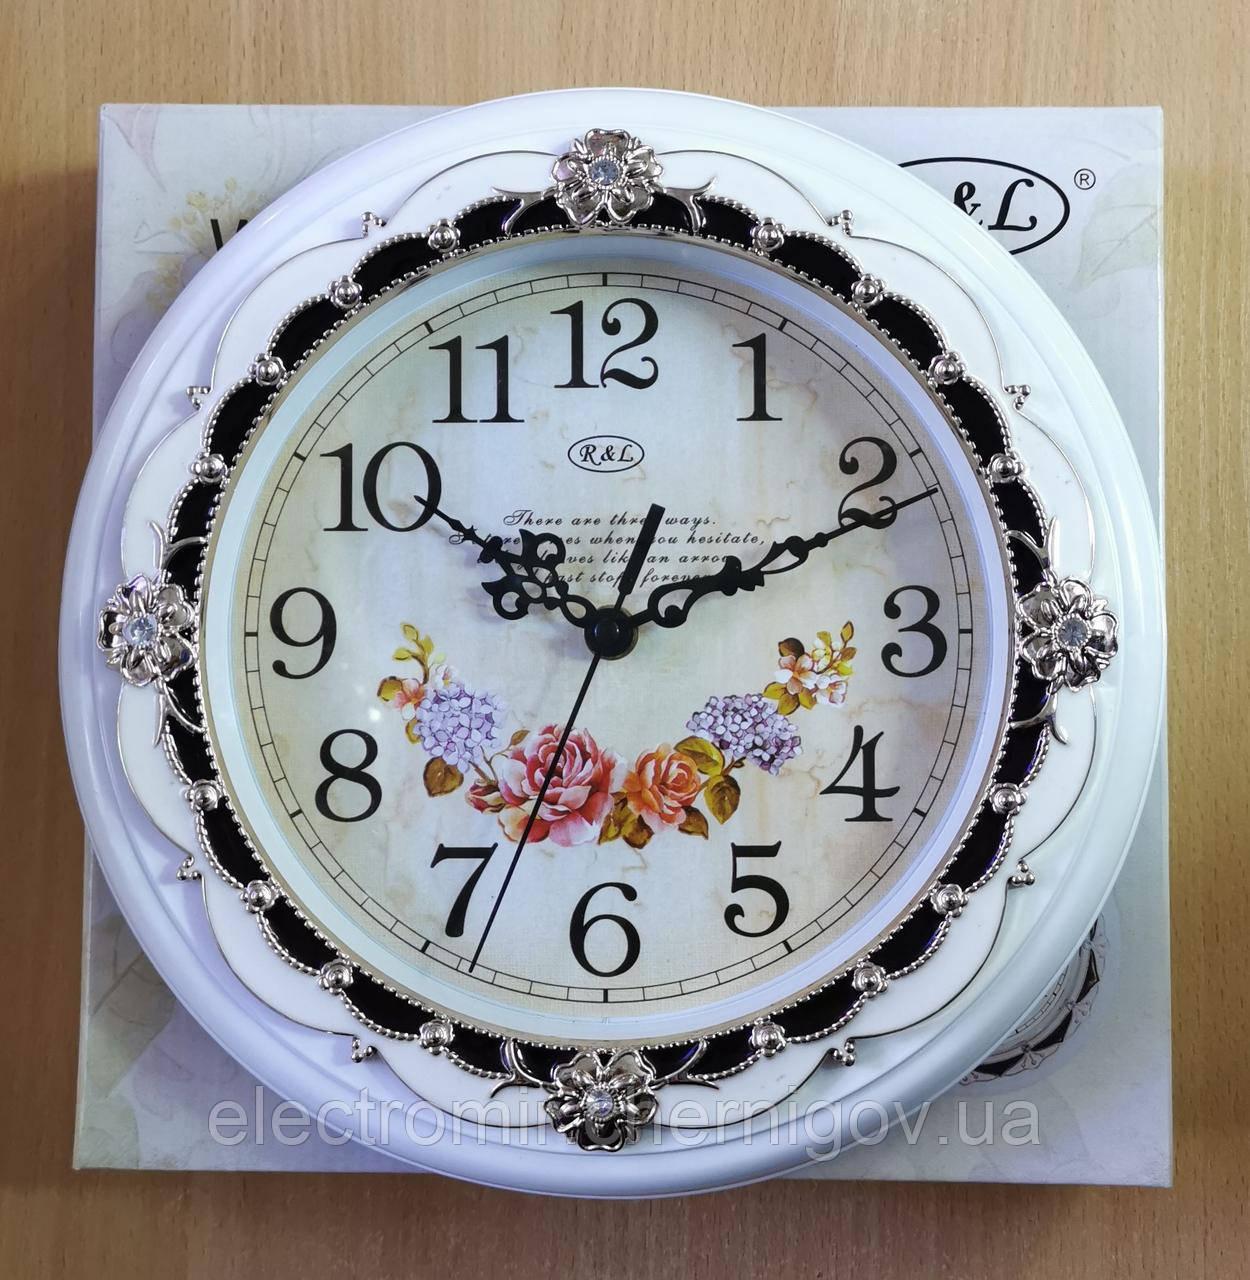 Часы настенные R&L 8002 30 см диаметр (белые)